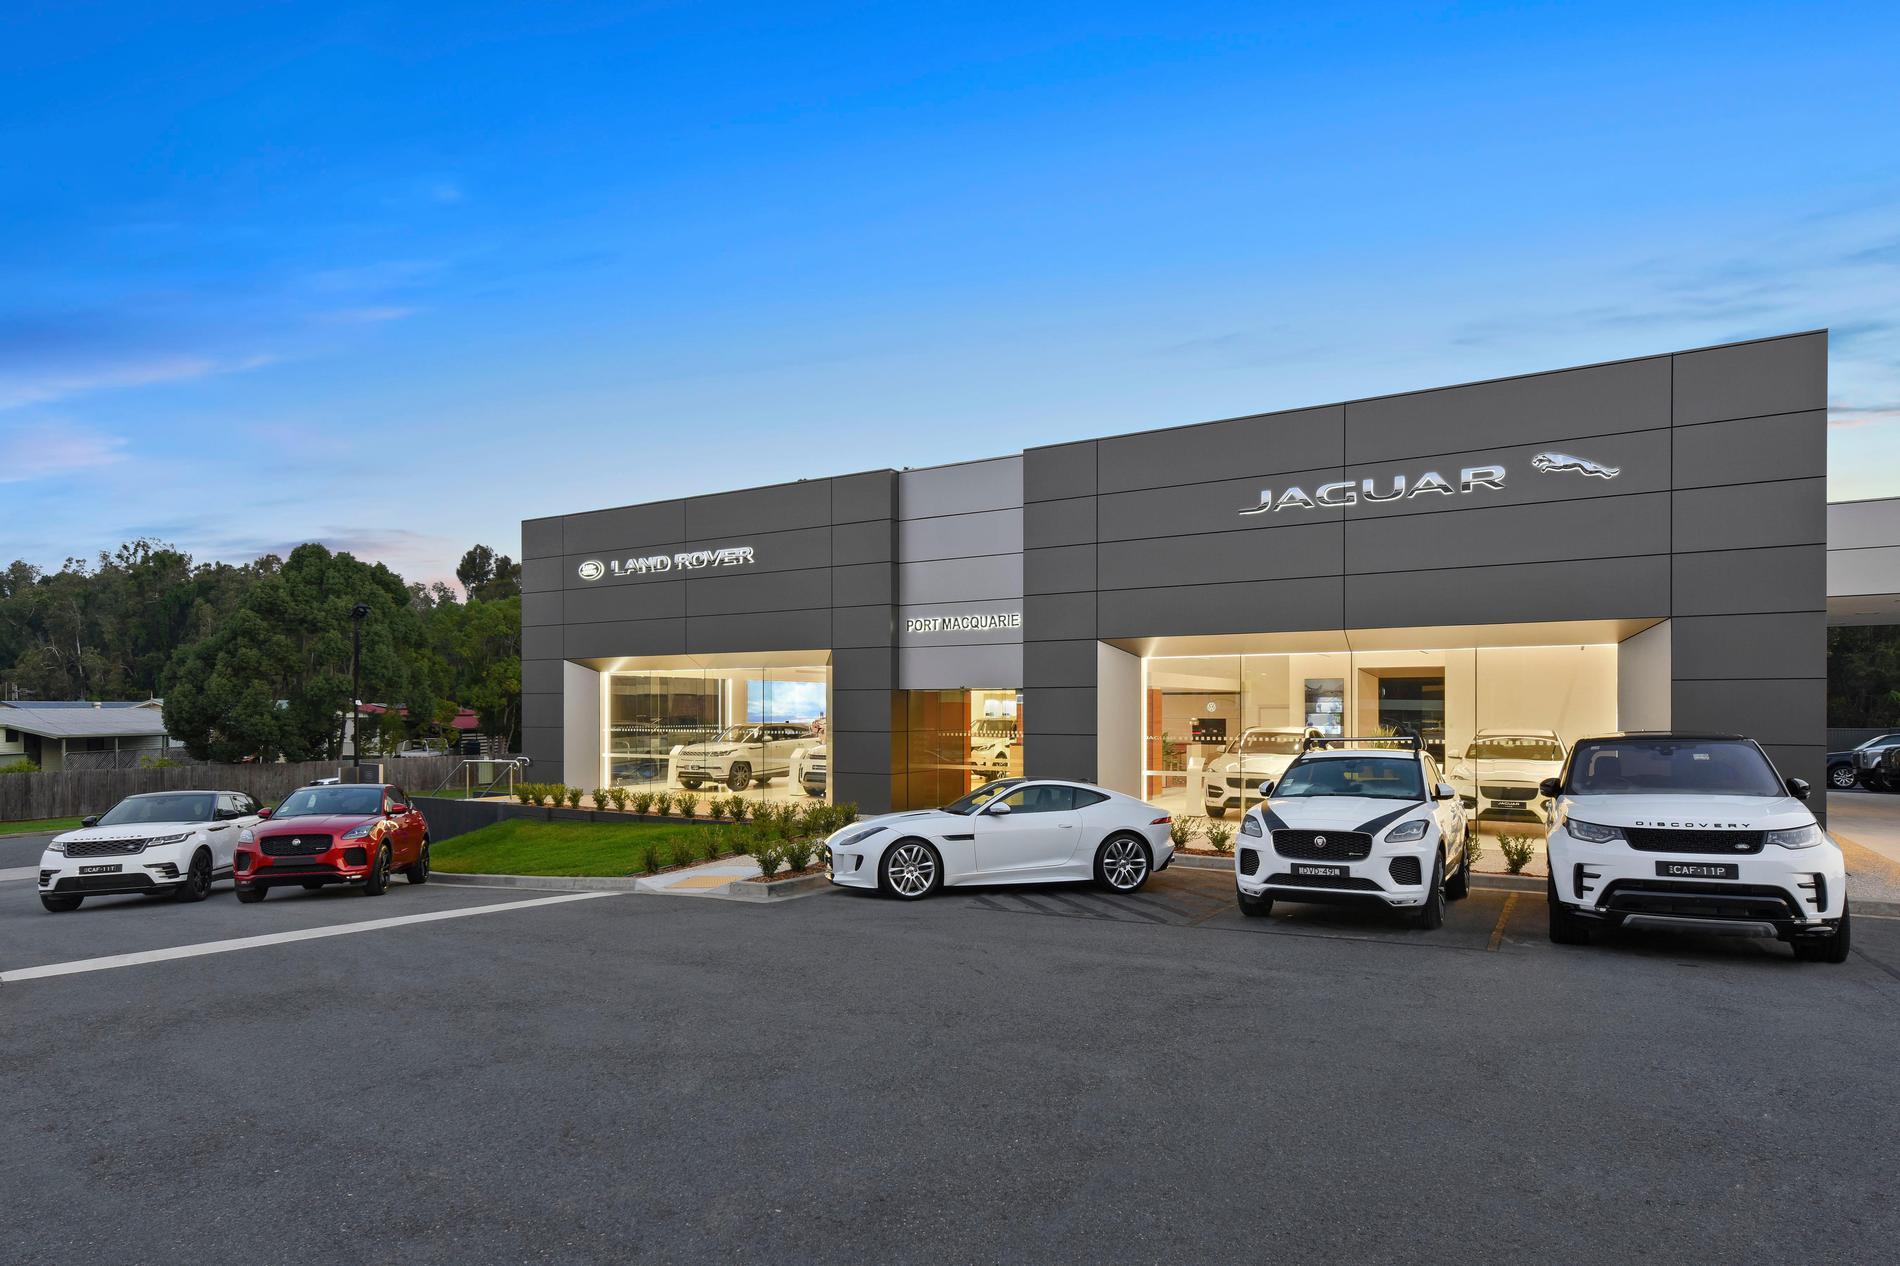 Land Rover Dealership >> Port Macquarie Land Rover Land Rover Retailer In Port Macquarie